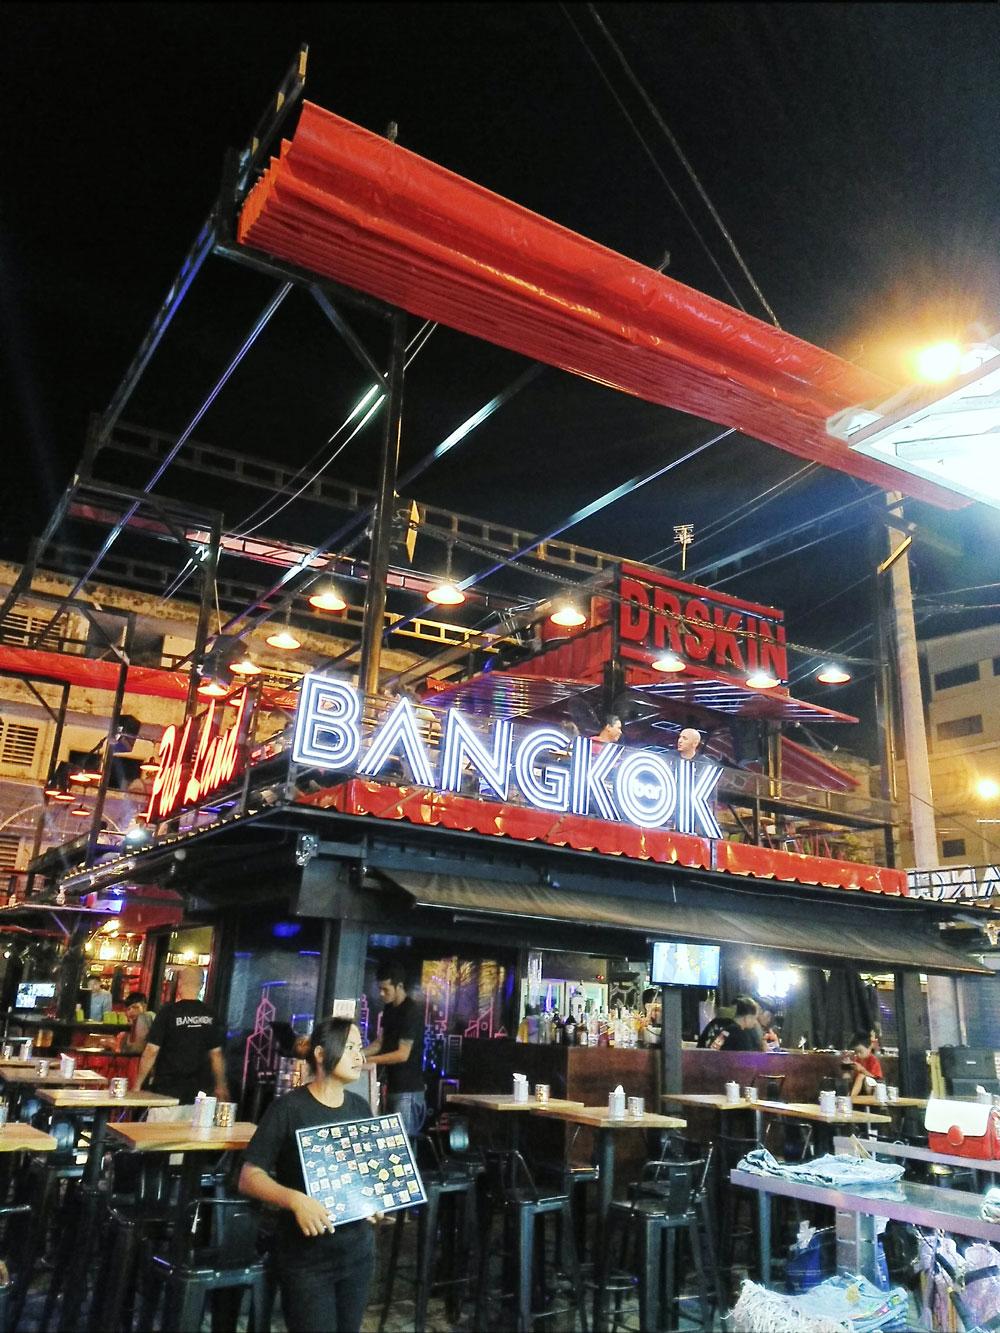 BANGKOKという名前のバー